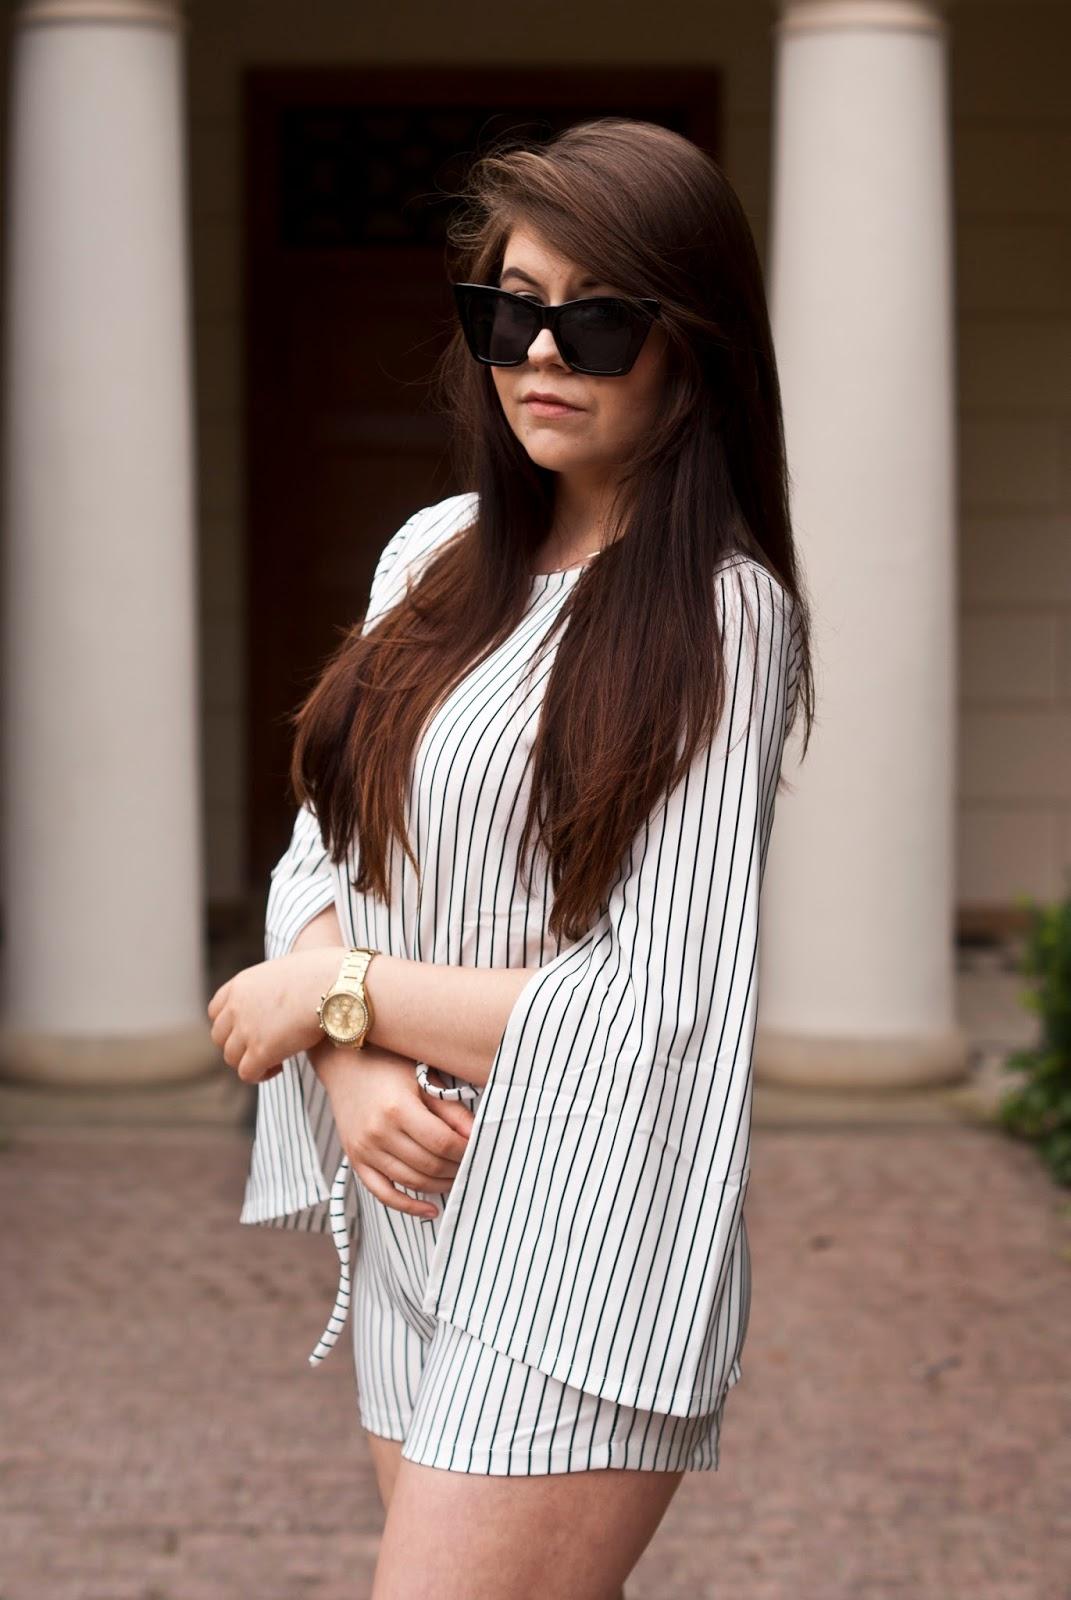 Kombinezon w paski / Jumpsuit Stripes fashion71.net